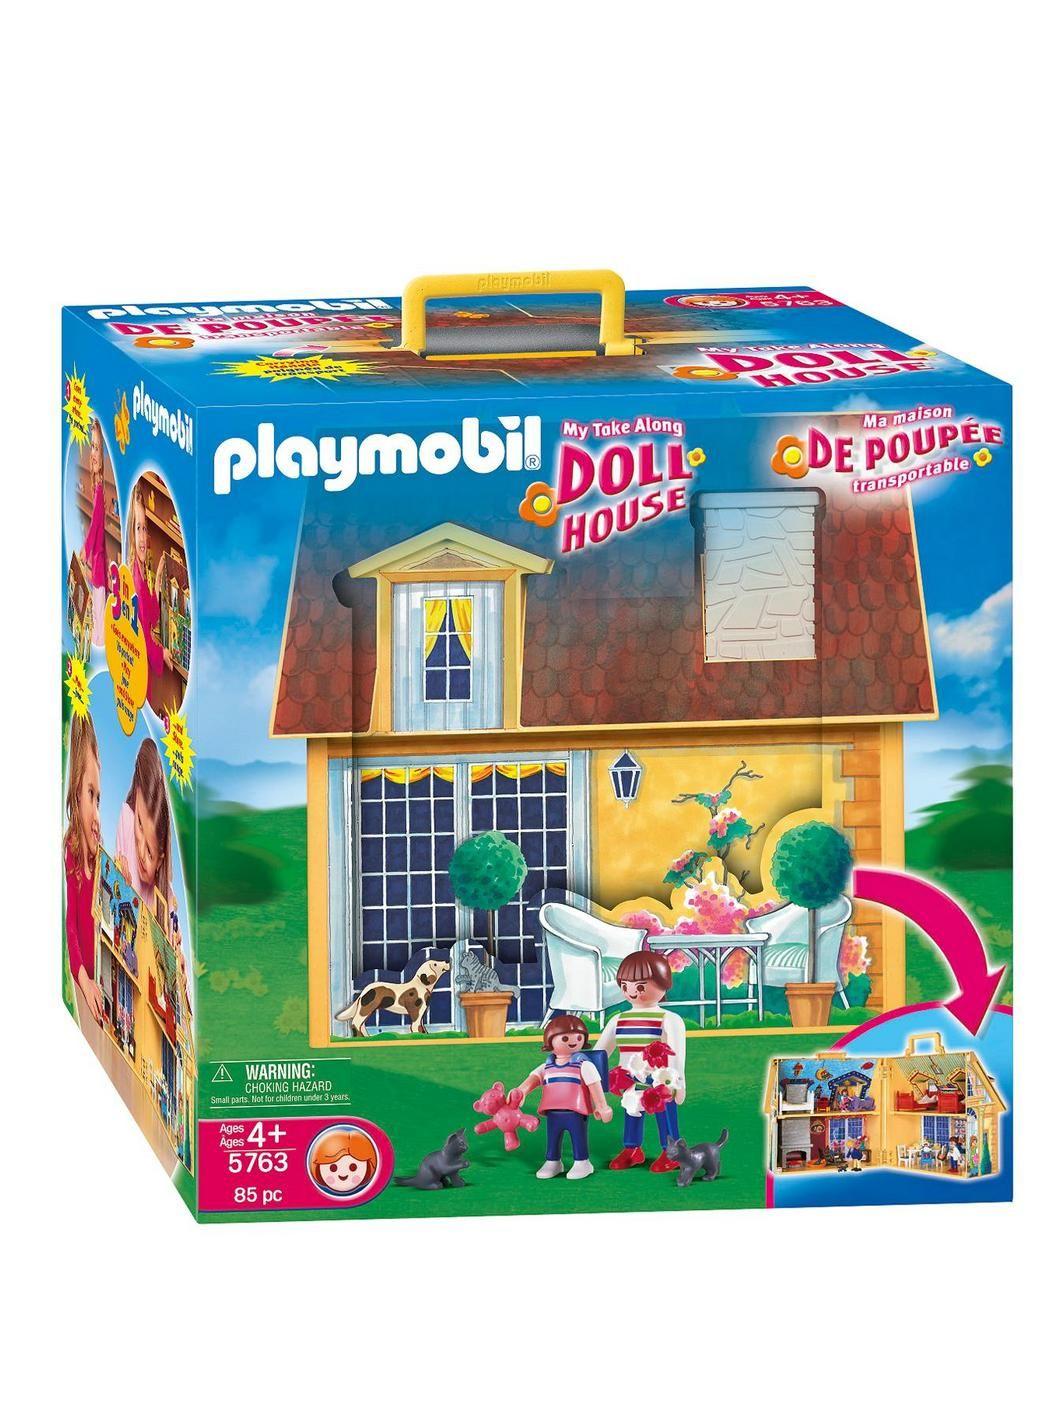 Playmobil 5167 My Take Along Dollhouse Doll House Playmobil Dolls